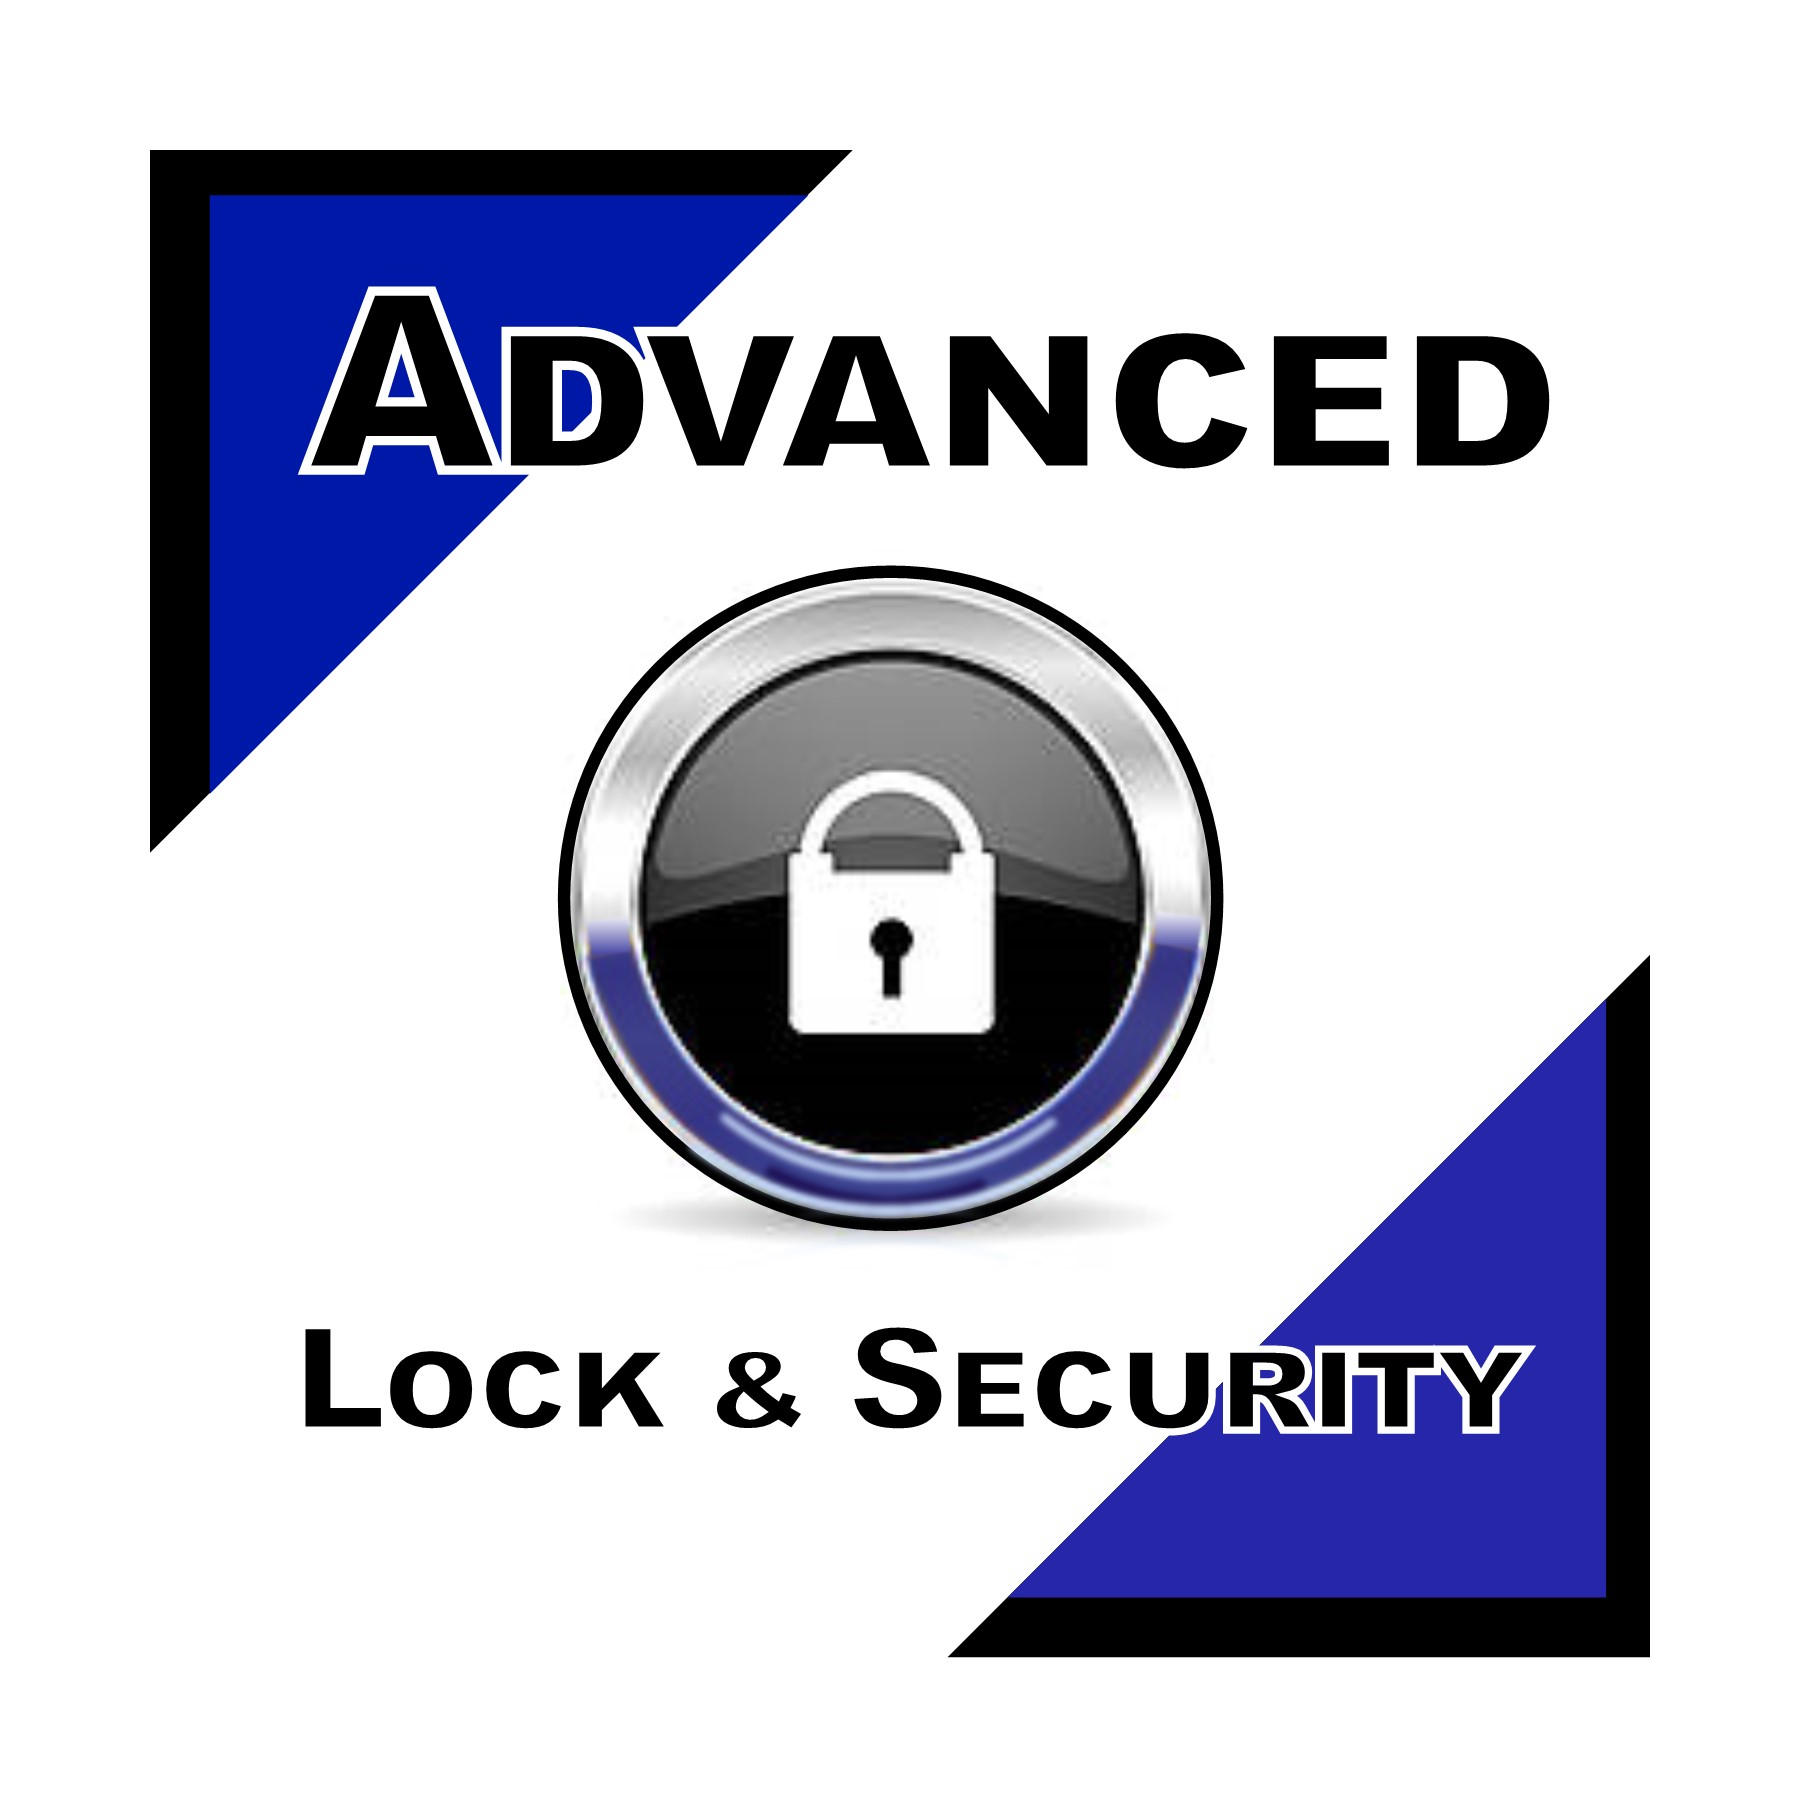 Advanced Lock & Security Inc.